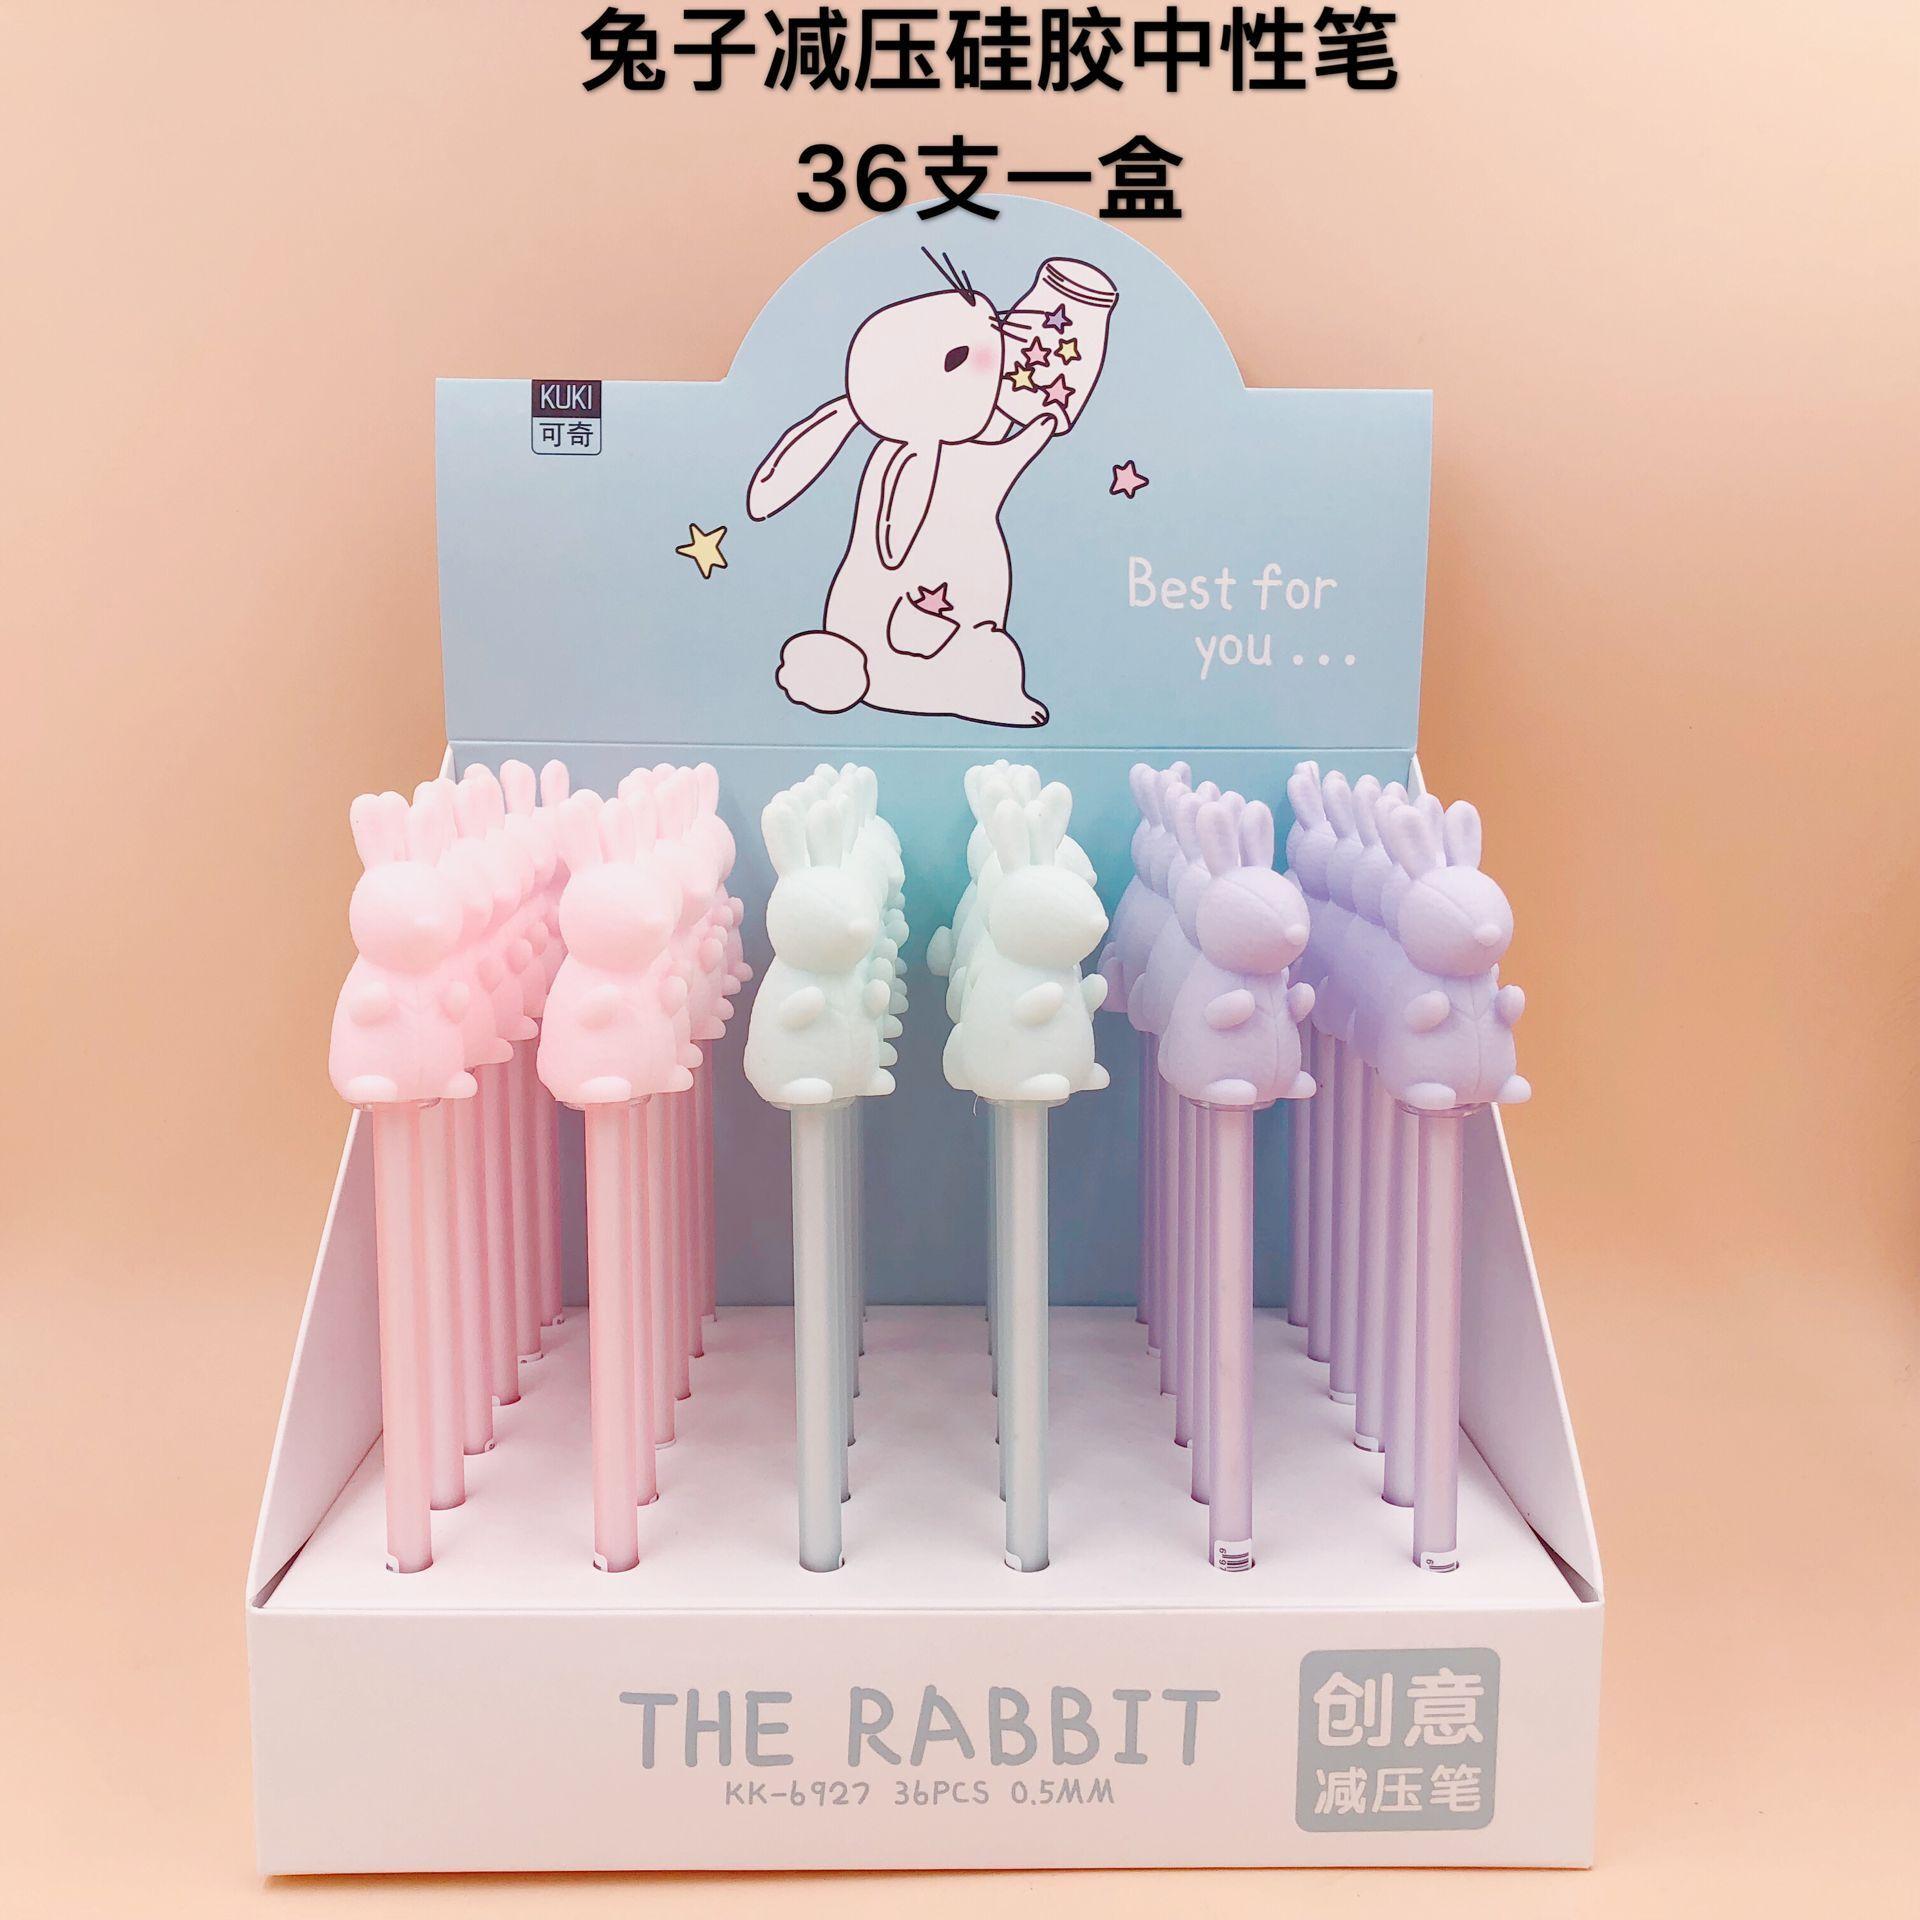 36pcs Gel Pens Kawai Rabbit Black Gel-ink Pen Student for Writing Cute Stationery Office School Supplies 0.5mm